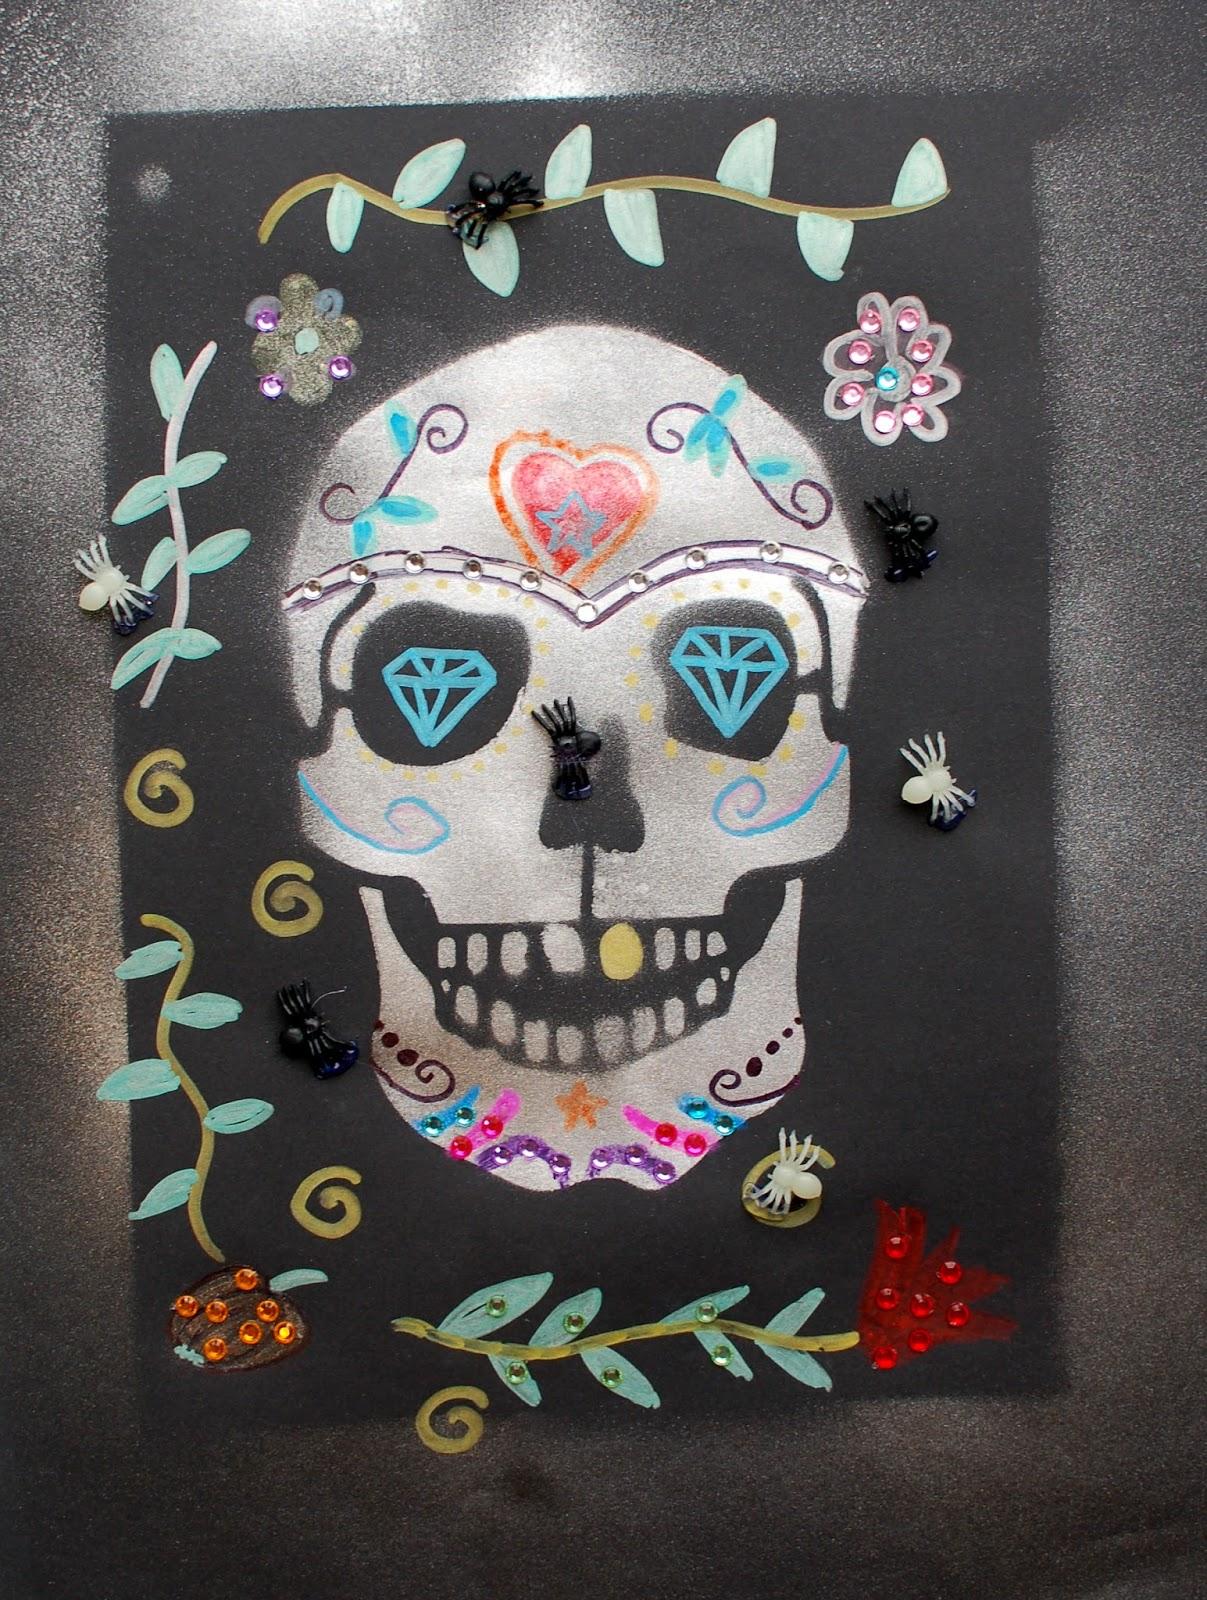 Sunnyside Art House: Stenciled Sugar Skulls and Black Cats